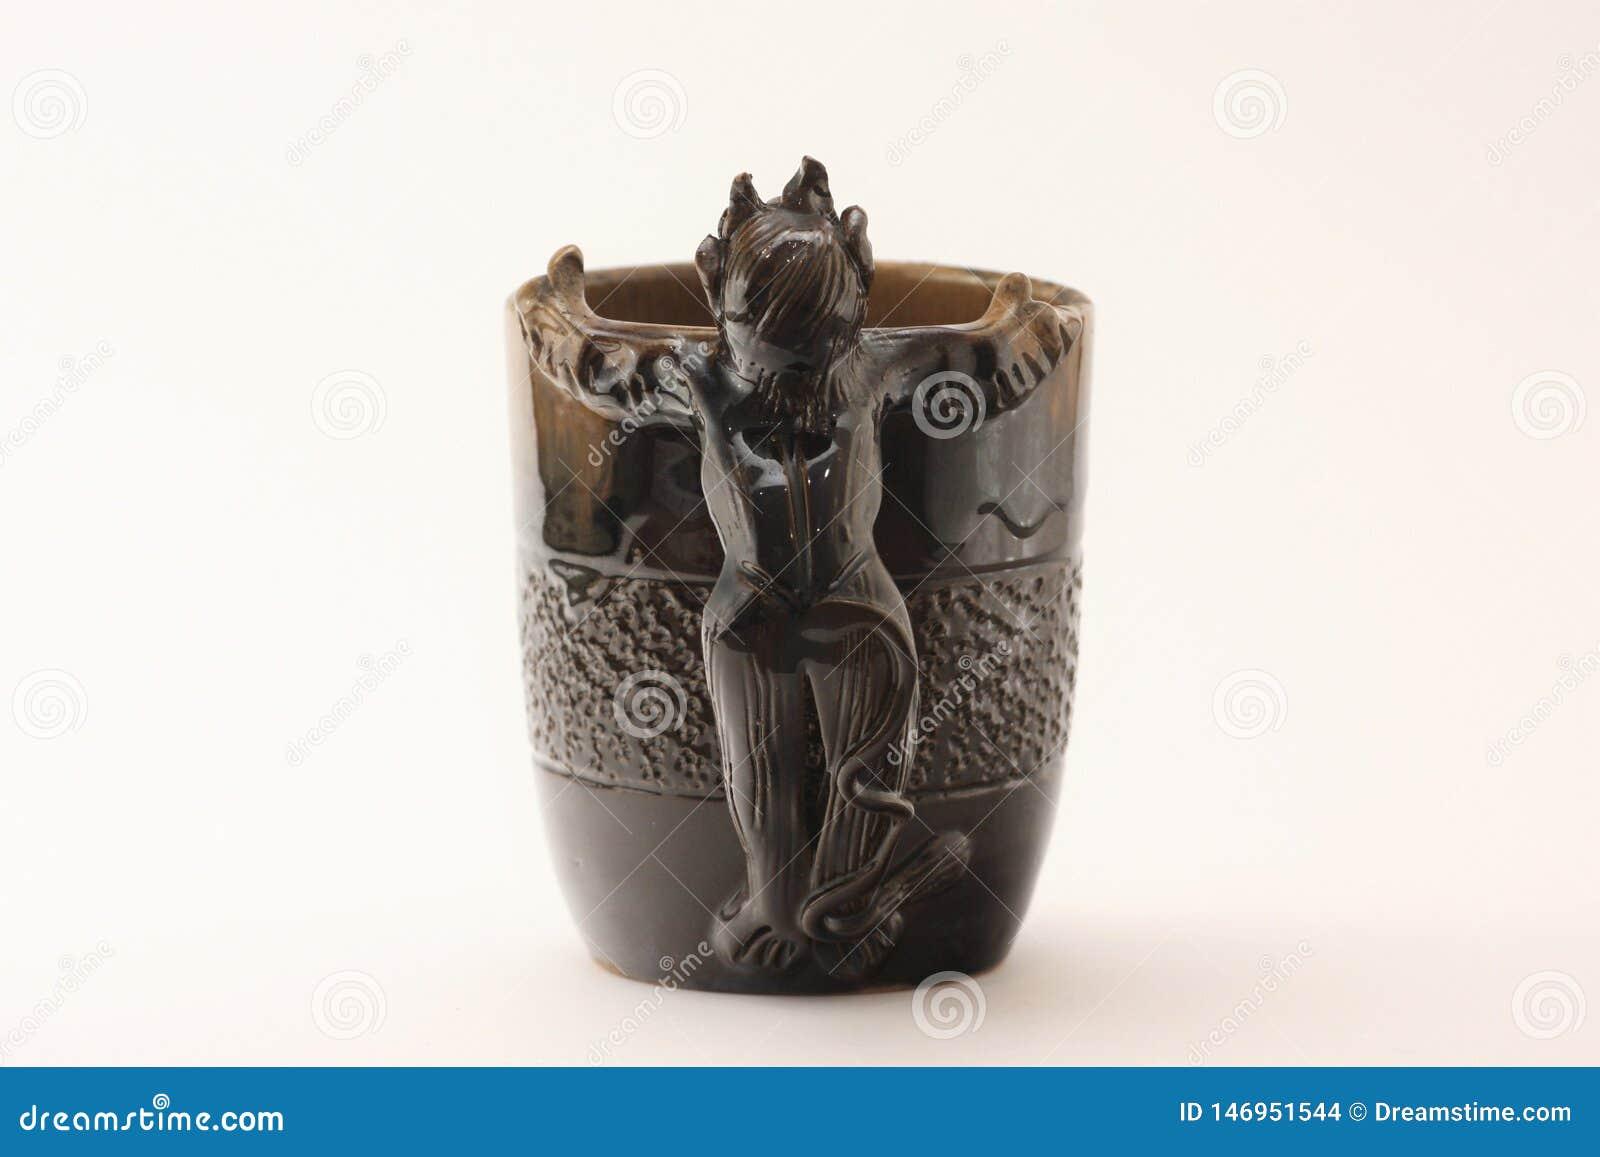 Vintage soviet USSR devil cup - bakcview